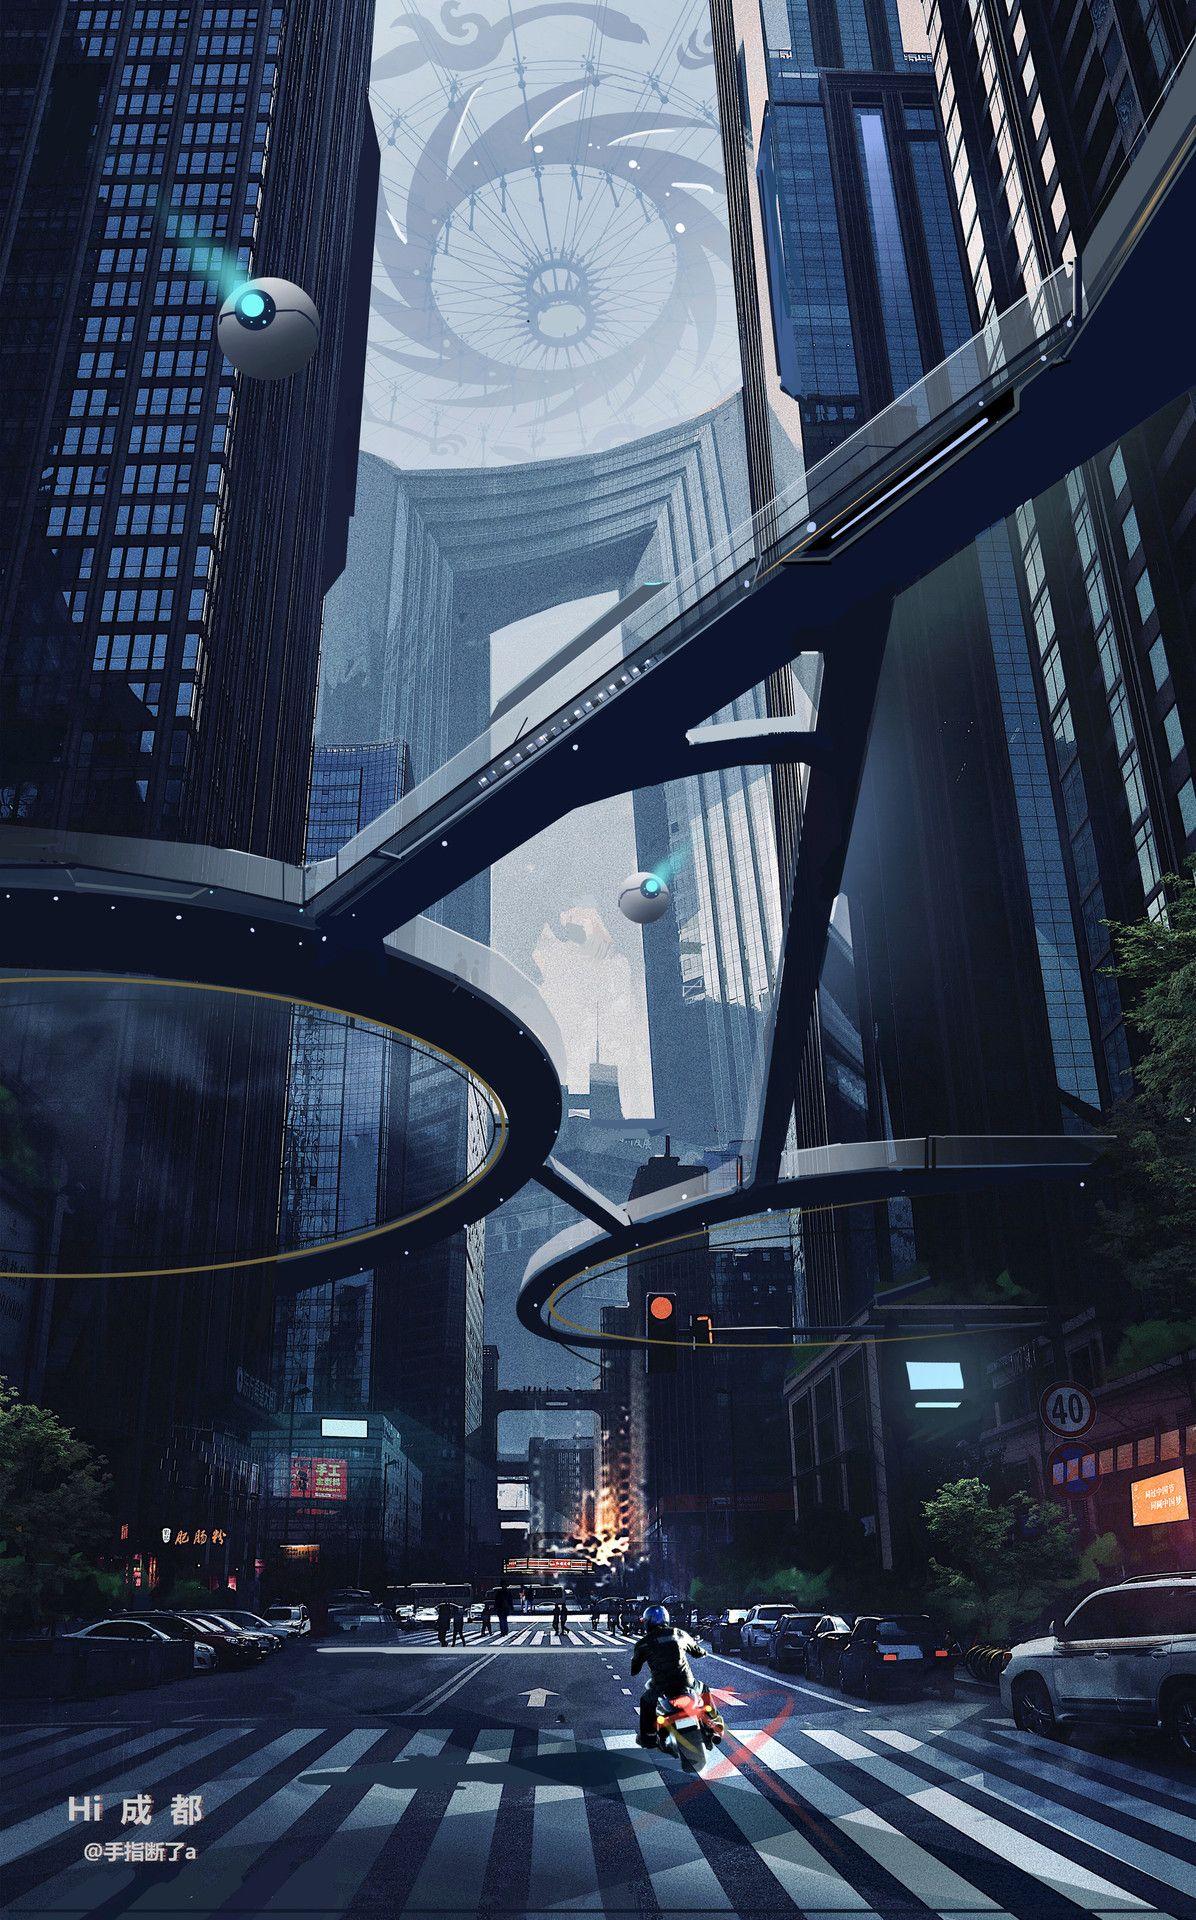 Pin by Pierre Vainqueur on CENARIO - inspiração - surreal | Futuristic  city, Futuristic art, Futuristic architecture